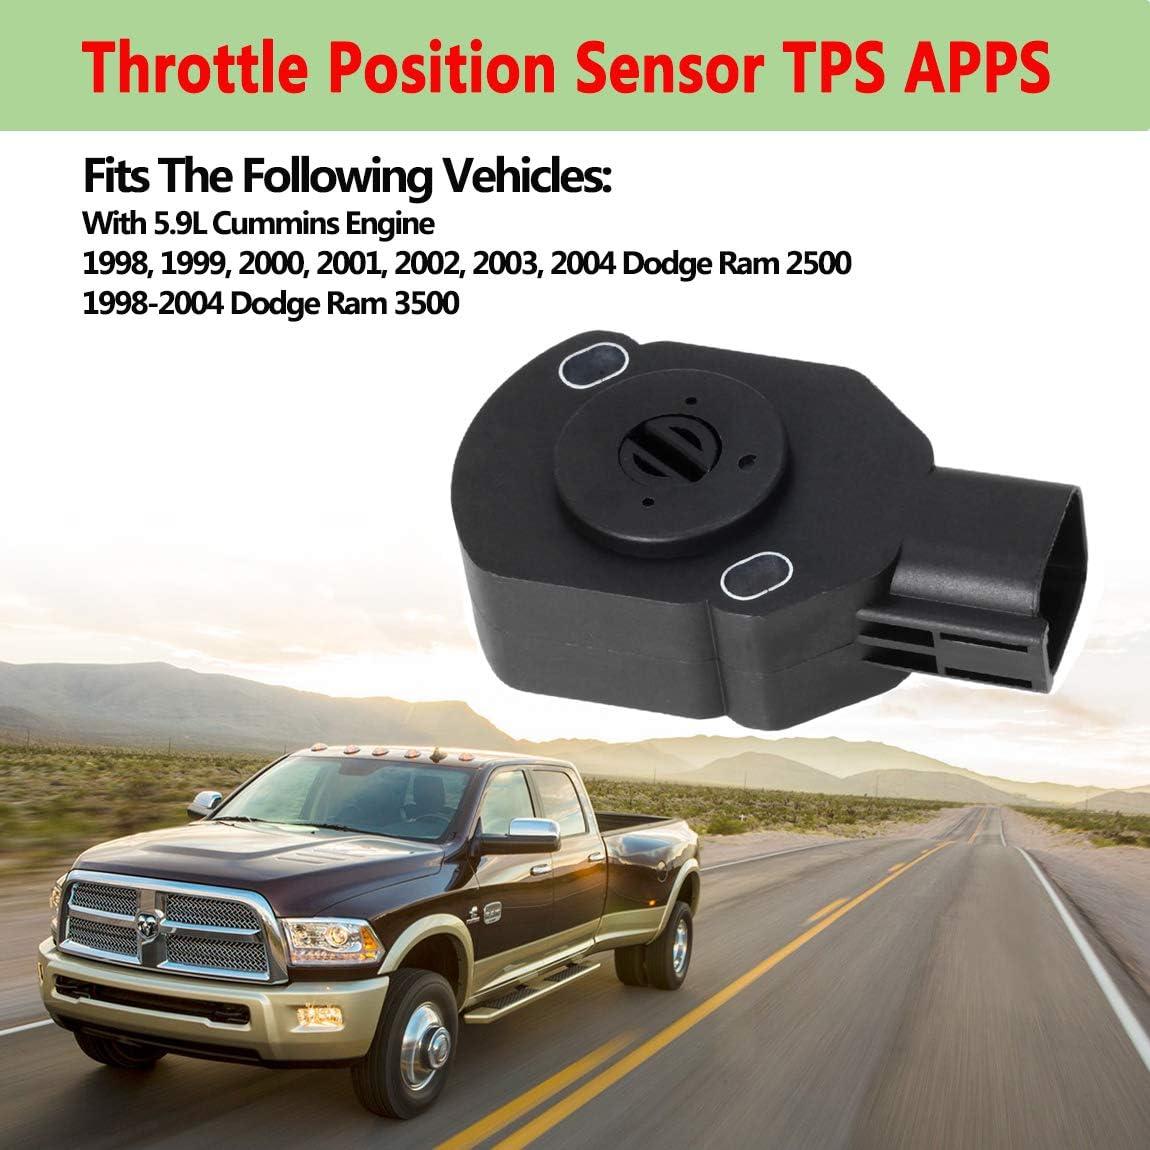 3970085 Throttle Position Sensor TPS APPS,Fit for 1998-2004 Dodge Ram 2500 3500,98-04 Cummins Diesel 5.9L Replacement 53031575,53031575AH,53031576,53031576AD,AP63427 Accelerator Pedal Position Sensor